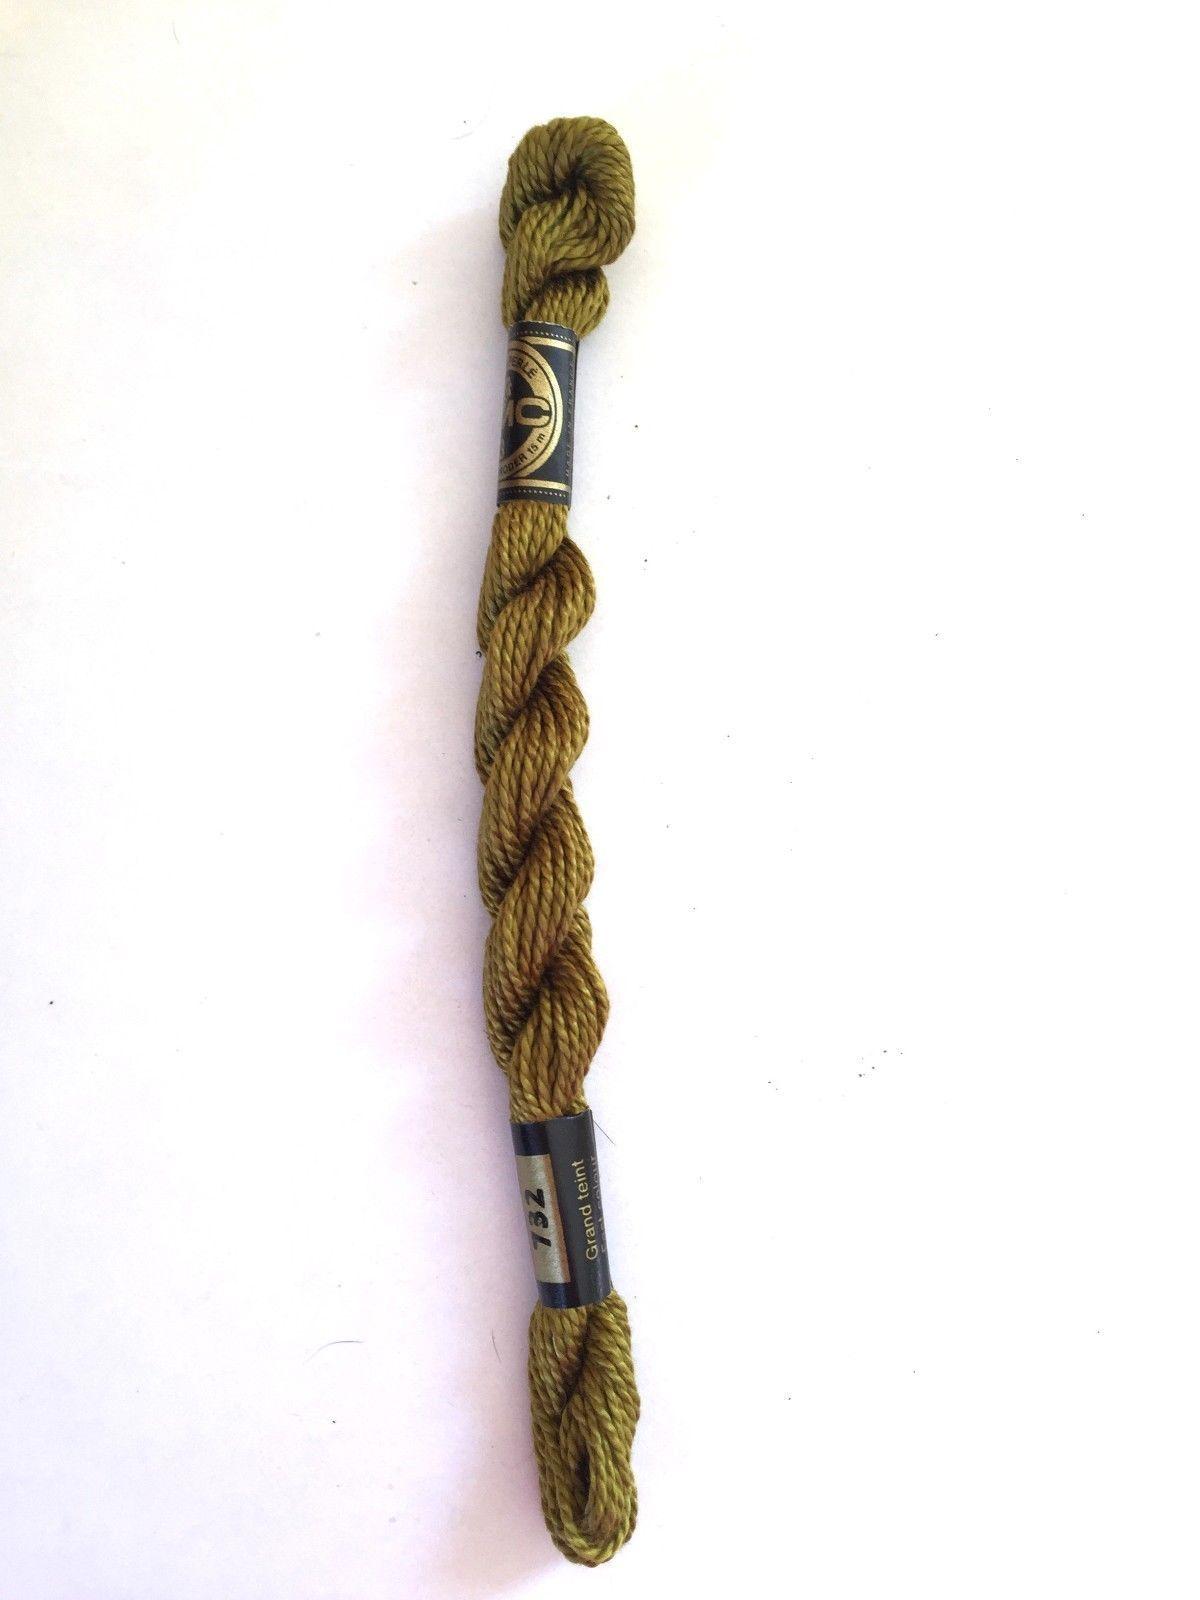 DMC Pearl Cotton #3 #732 15 M Skein Coton Perle Needlepoint Thread Article 115 - $1.79